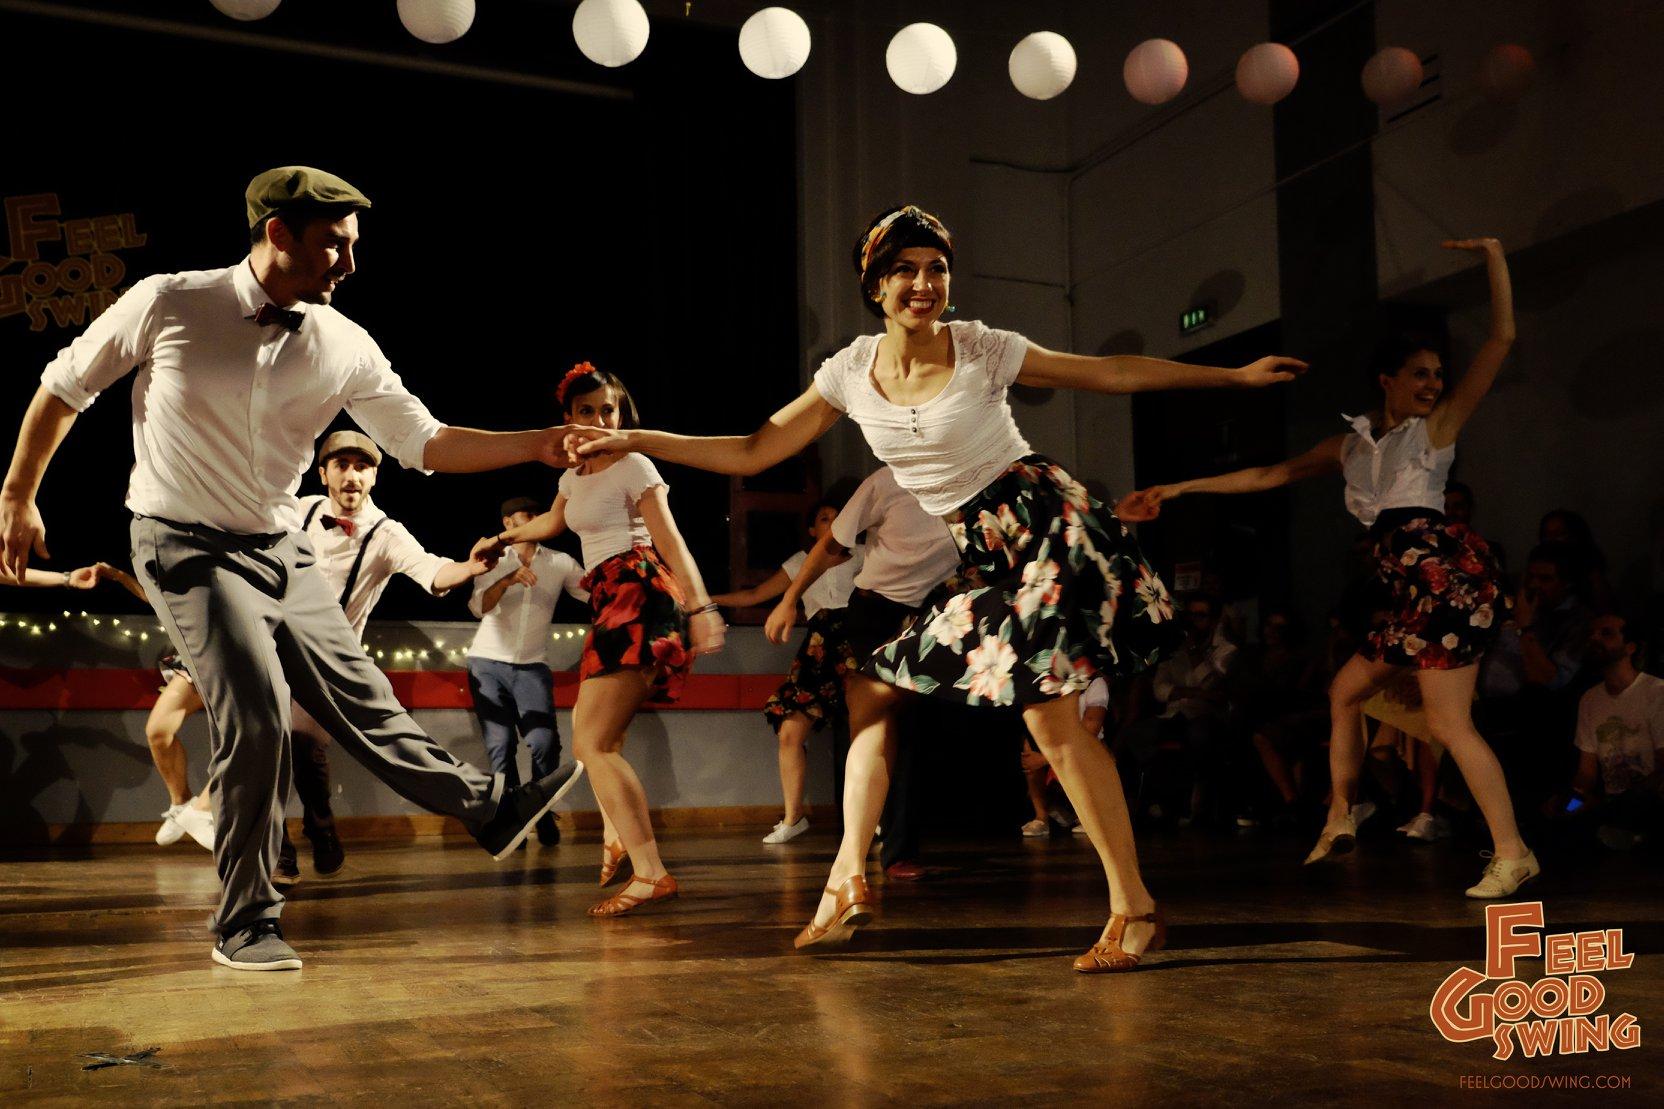 Chiara e Ale ballano Lindy Hop